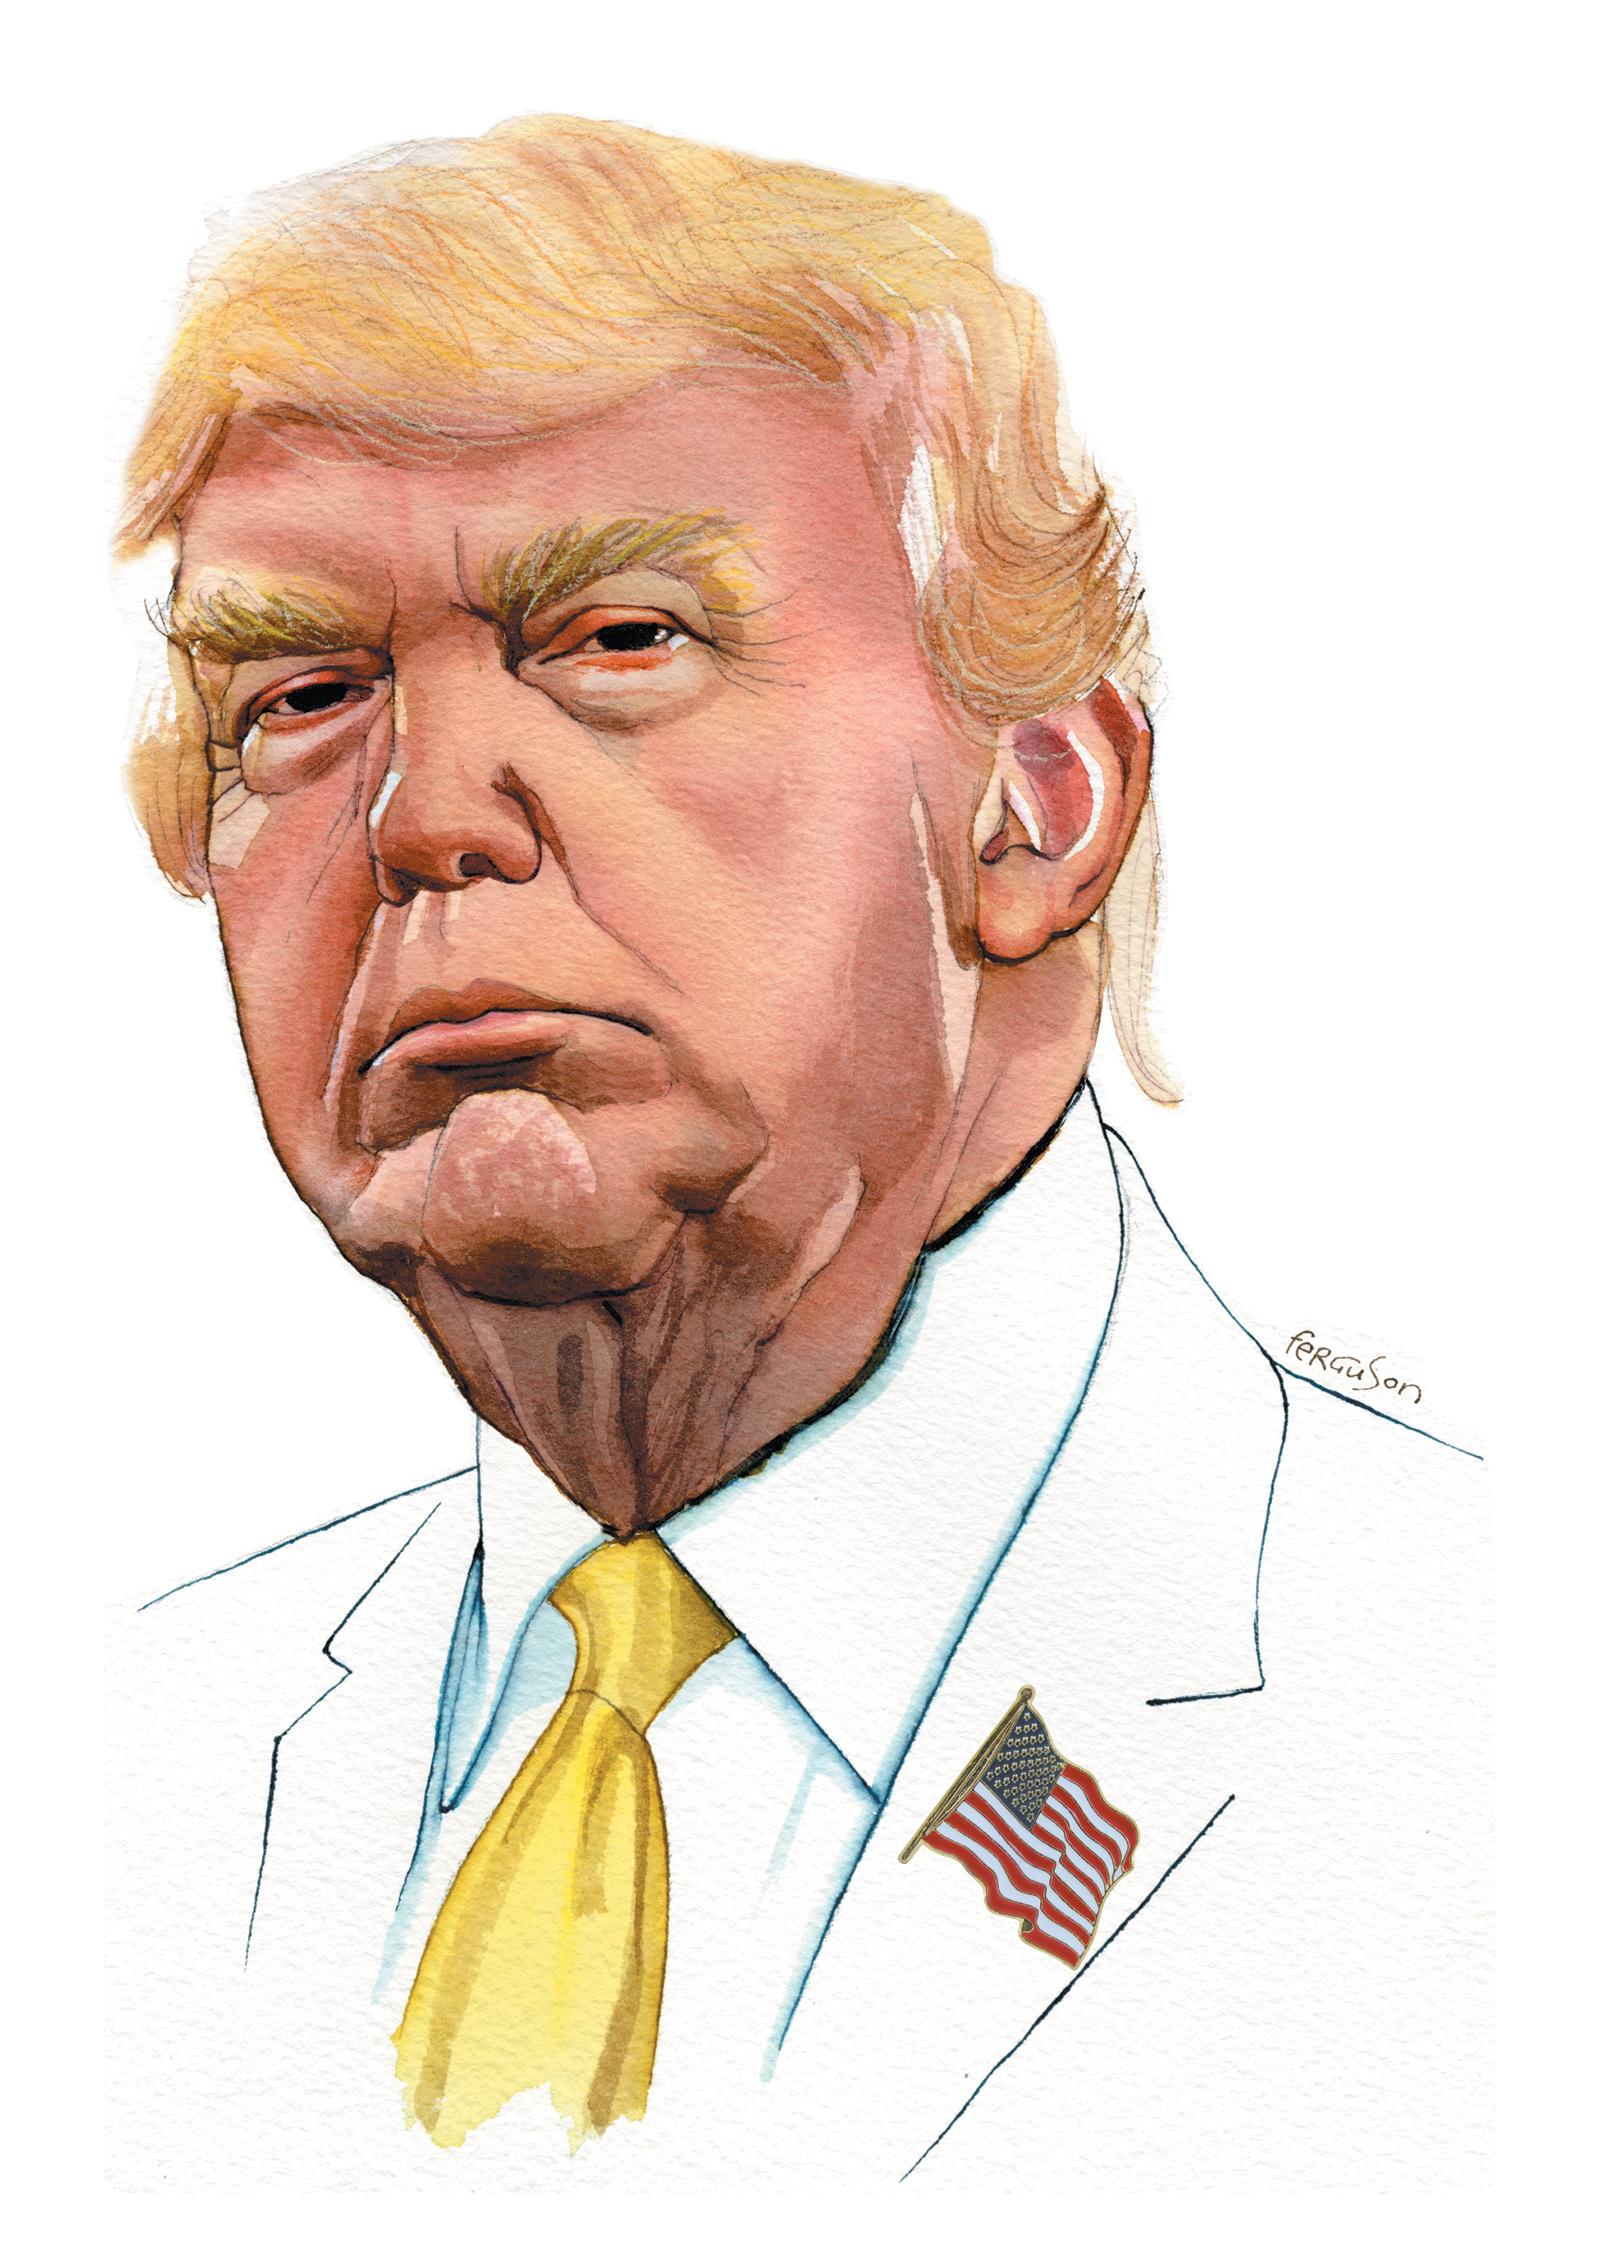 Rep  John Katko  Donald Trump should drop out of presidential race